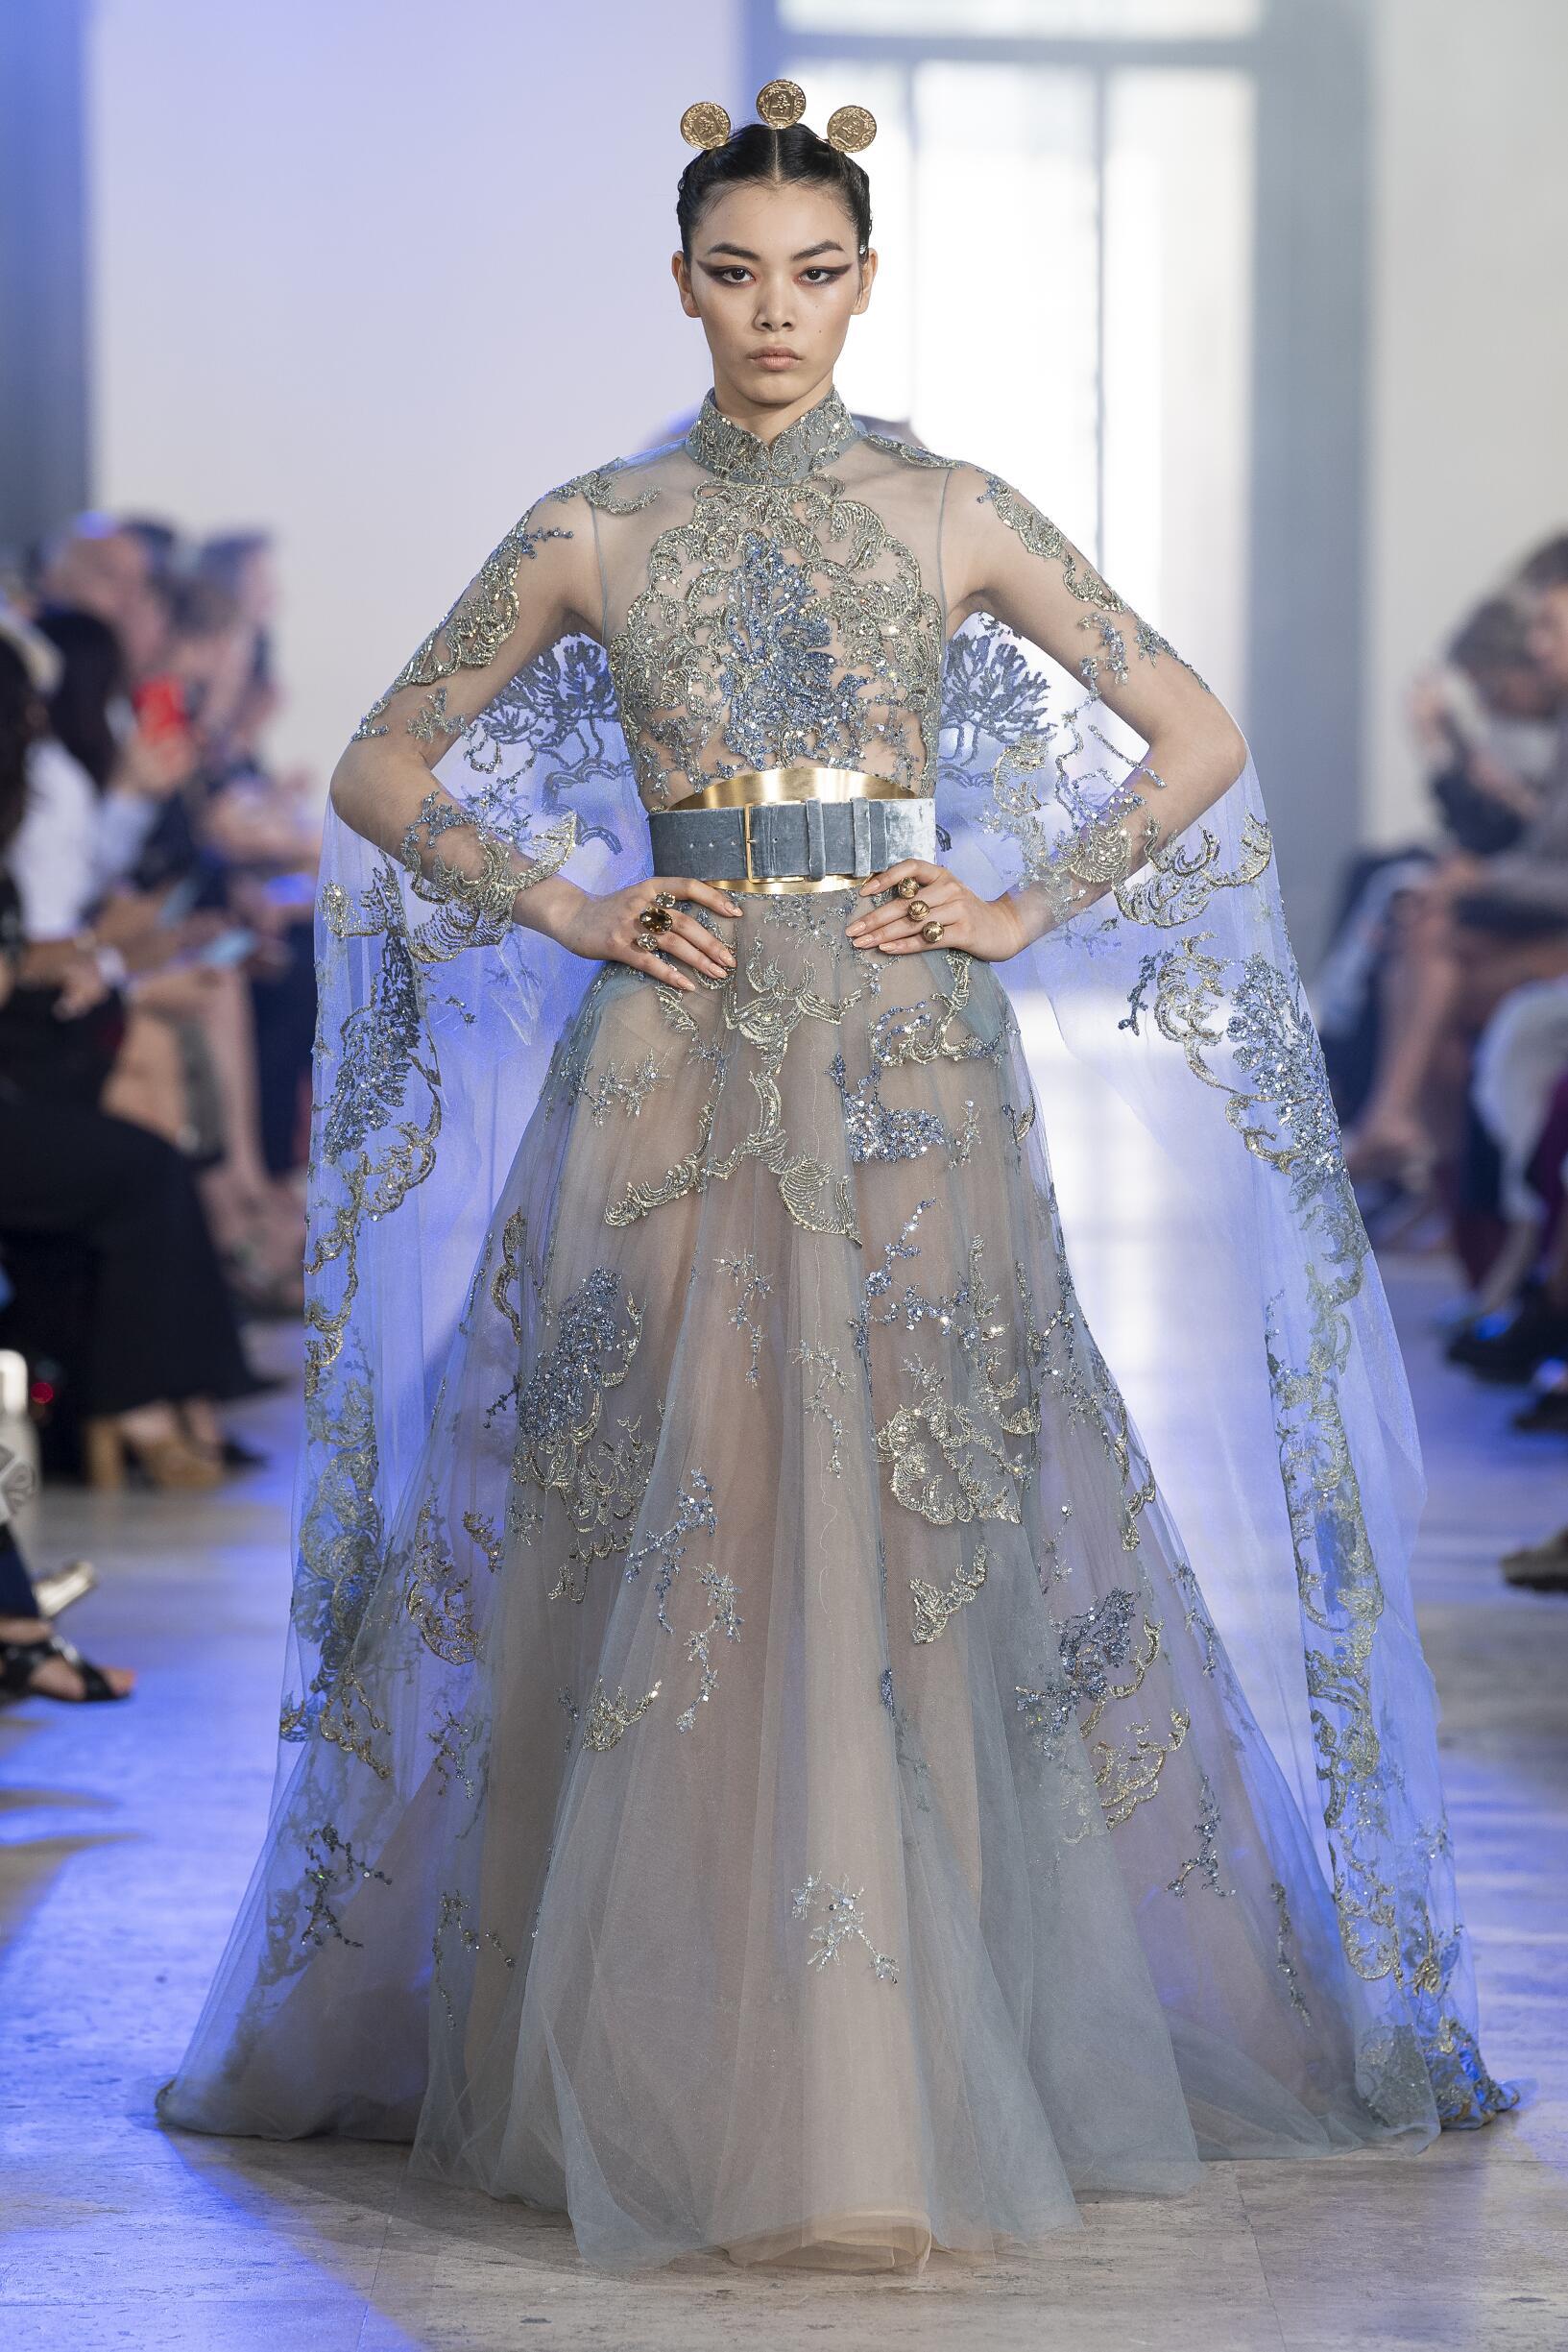 2019-20 Elie Saab Haute Couture Winter Catwalk